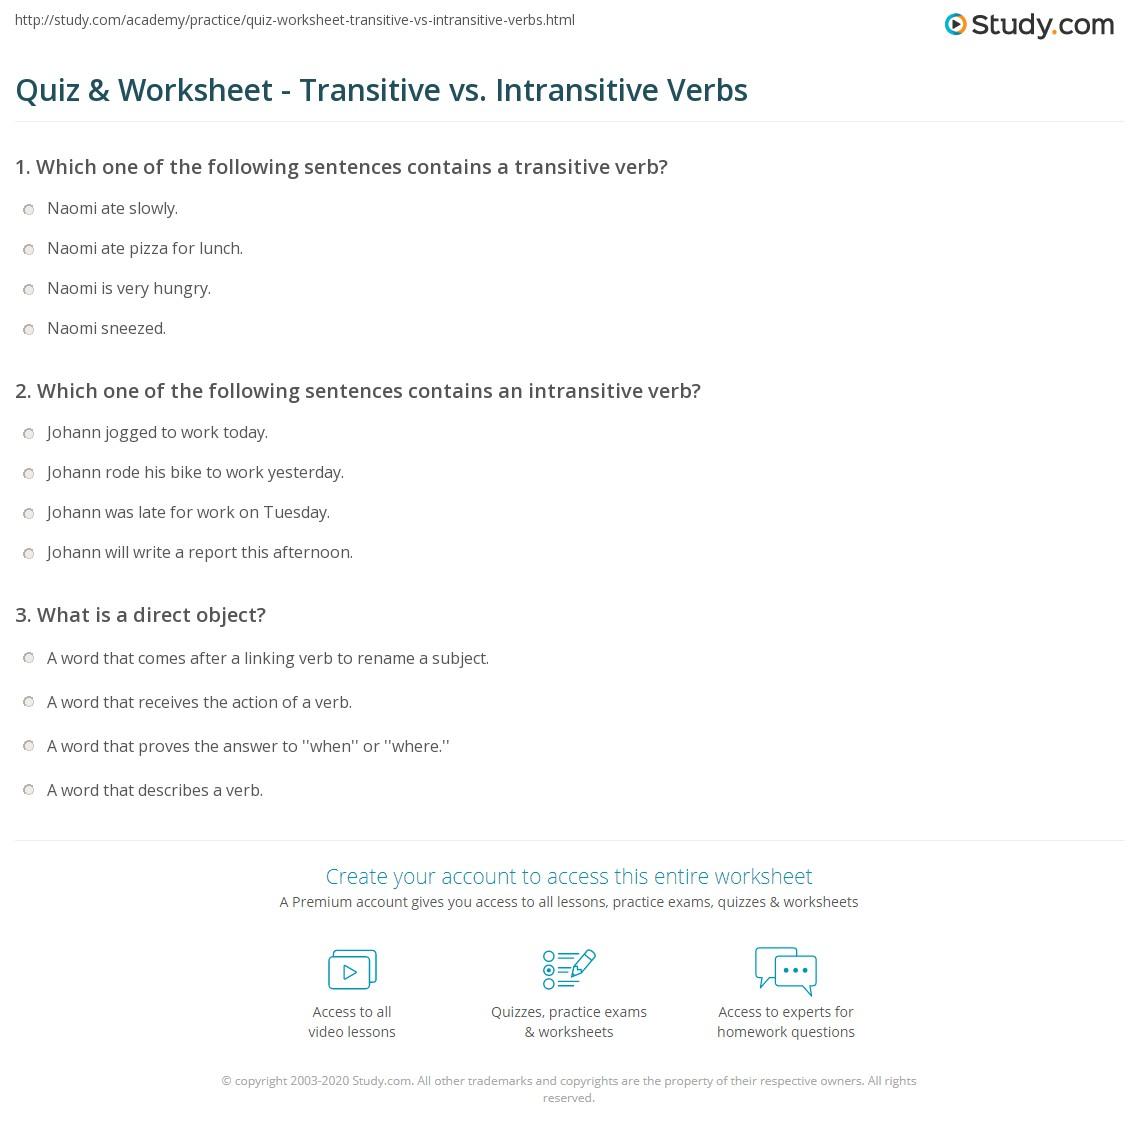 hight resolution of Quiz \u0026 Worksheet - Transitive vs. Intransitive Verbs   Study.com